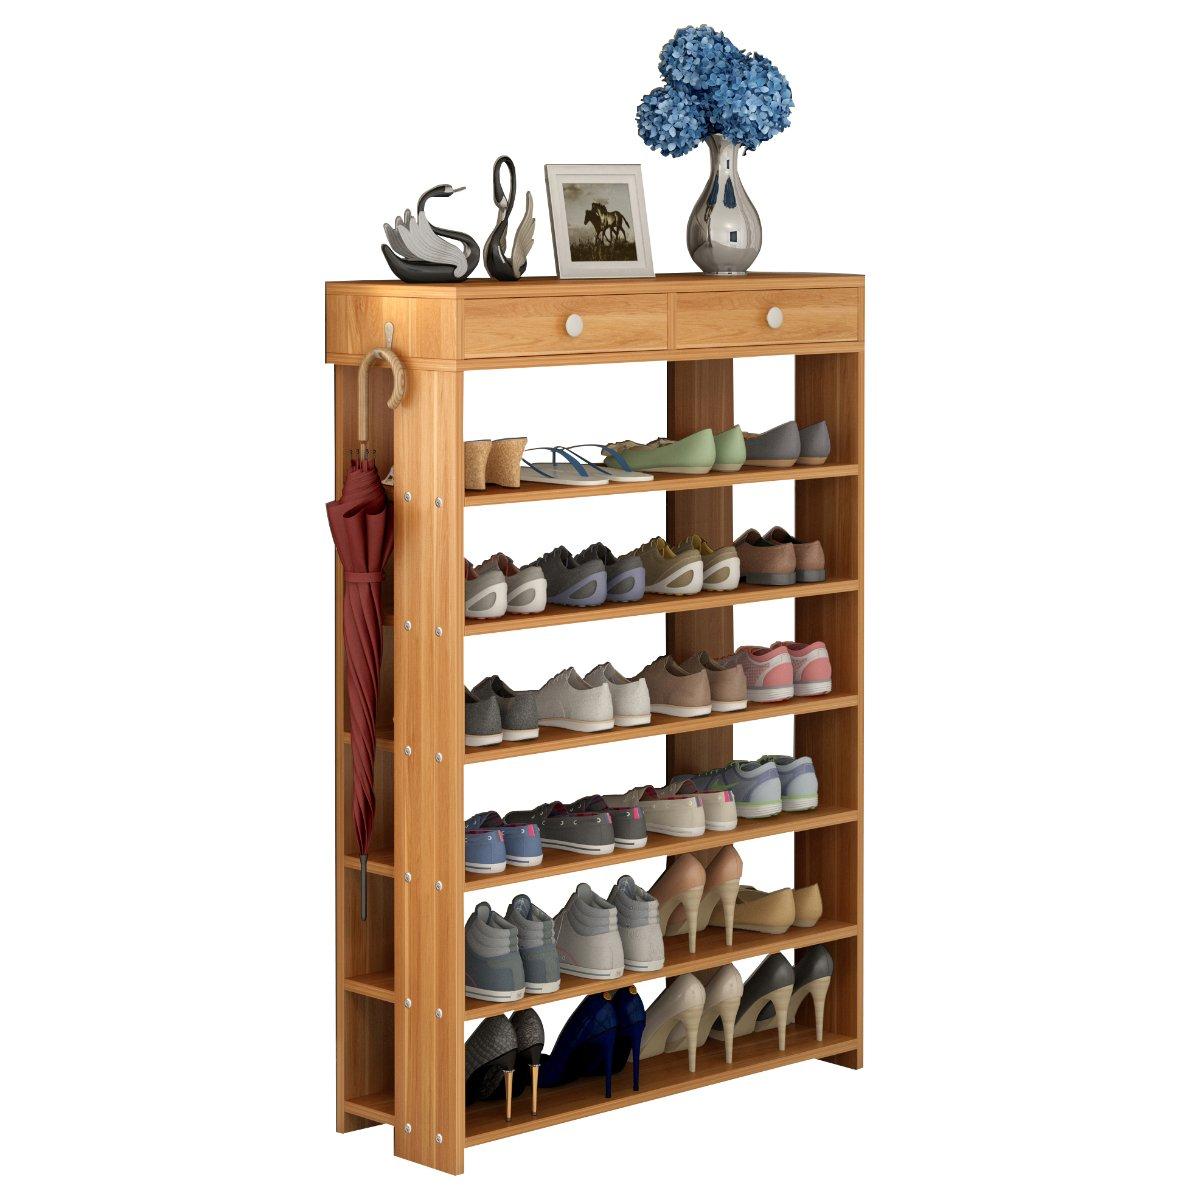 Polar Aurora Shoe Racks 7 Tiers Multi-function Economy Storage Rack Standing Shelf Organizer (Wood) by Polar Aurora (Image #4)